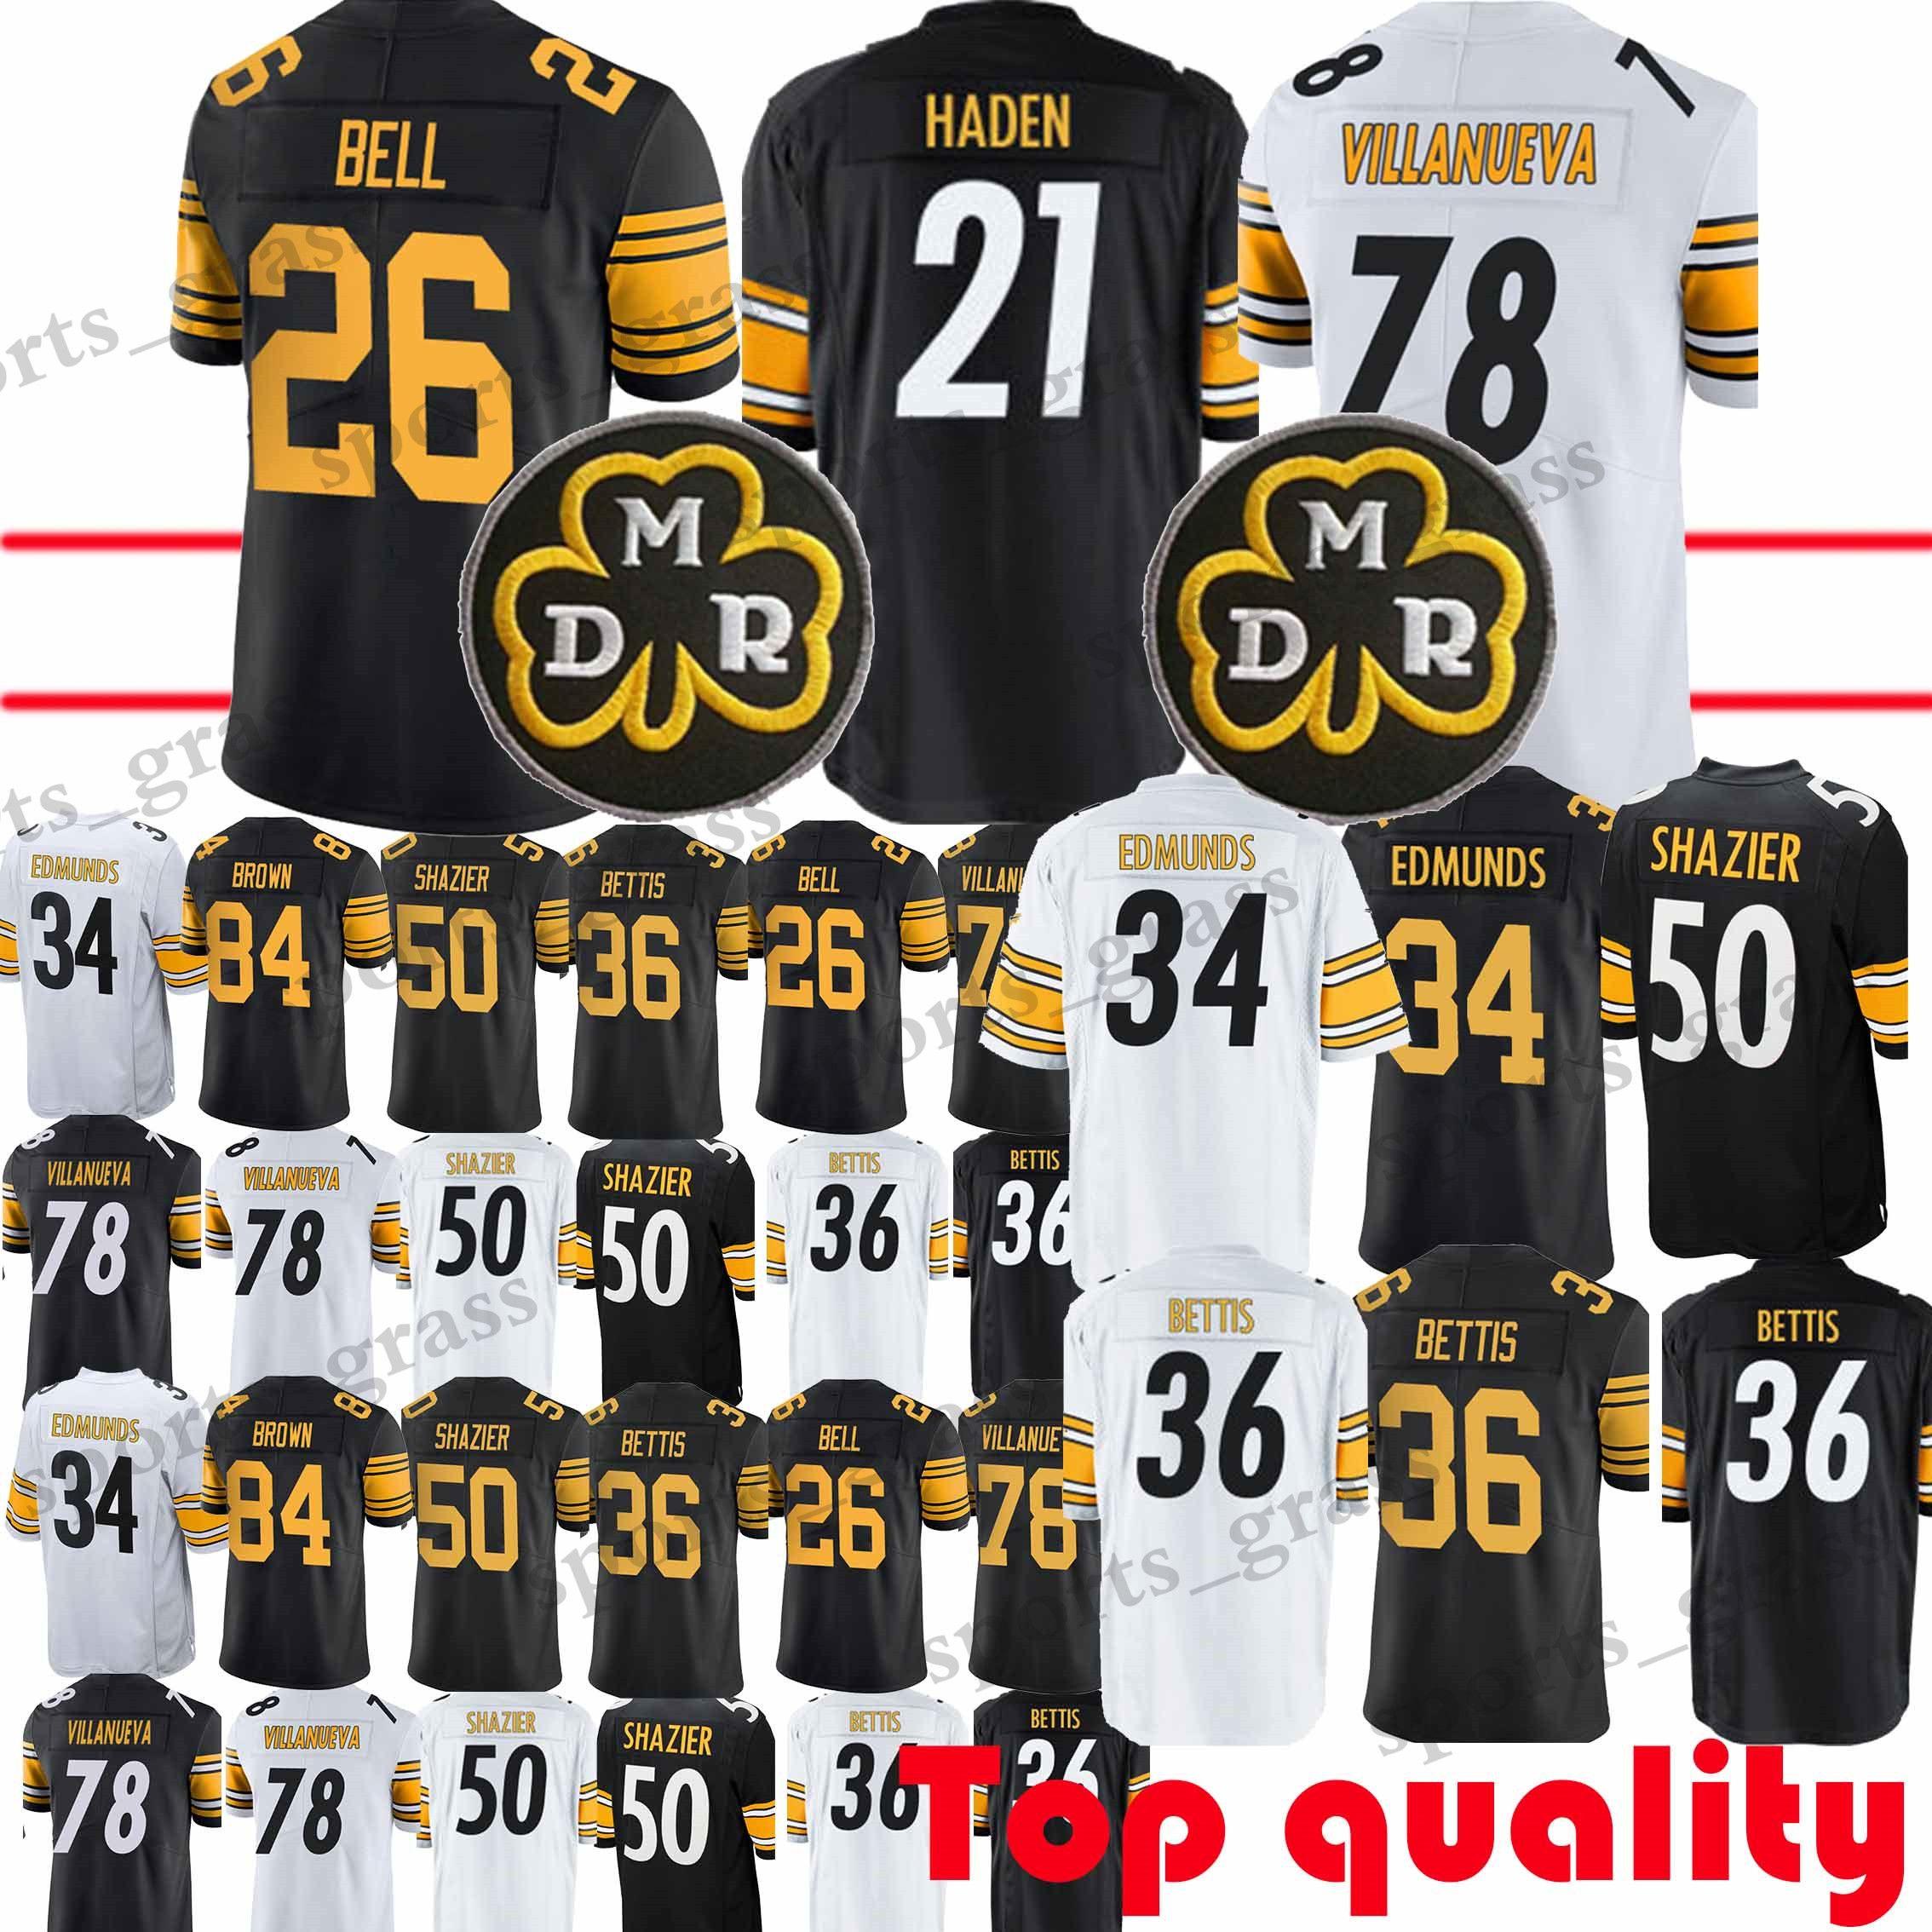 best service 46820 34783 26 Le Veon Bell 34 Terrell Edmunds Pittsburgh Steeler Jersey 50 Ryan  Shazier 21 Joe Haden 78 Villanueva Jerseys promotion